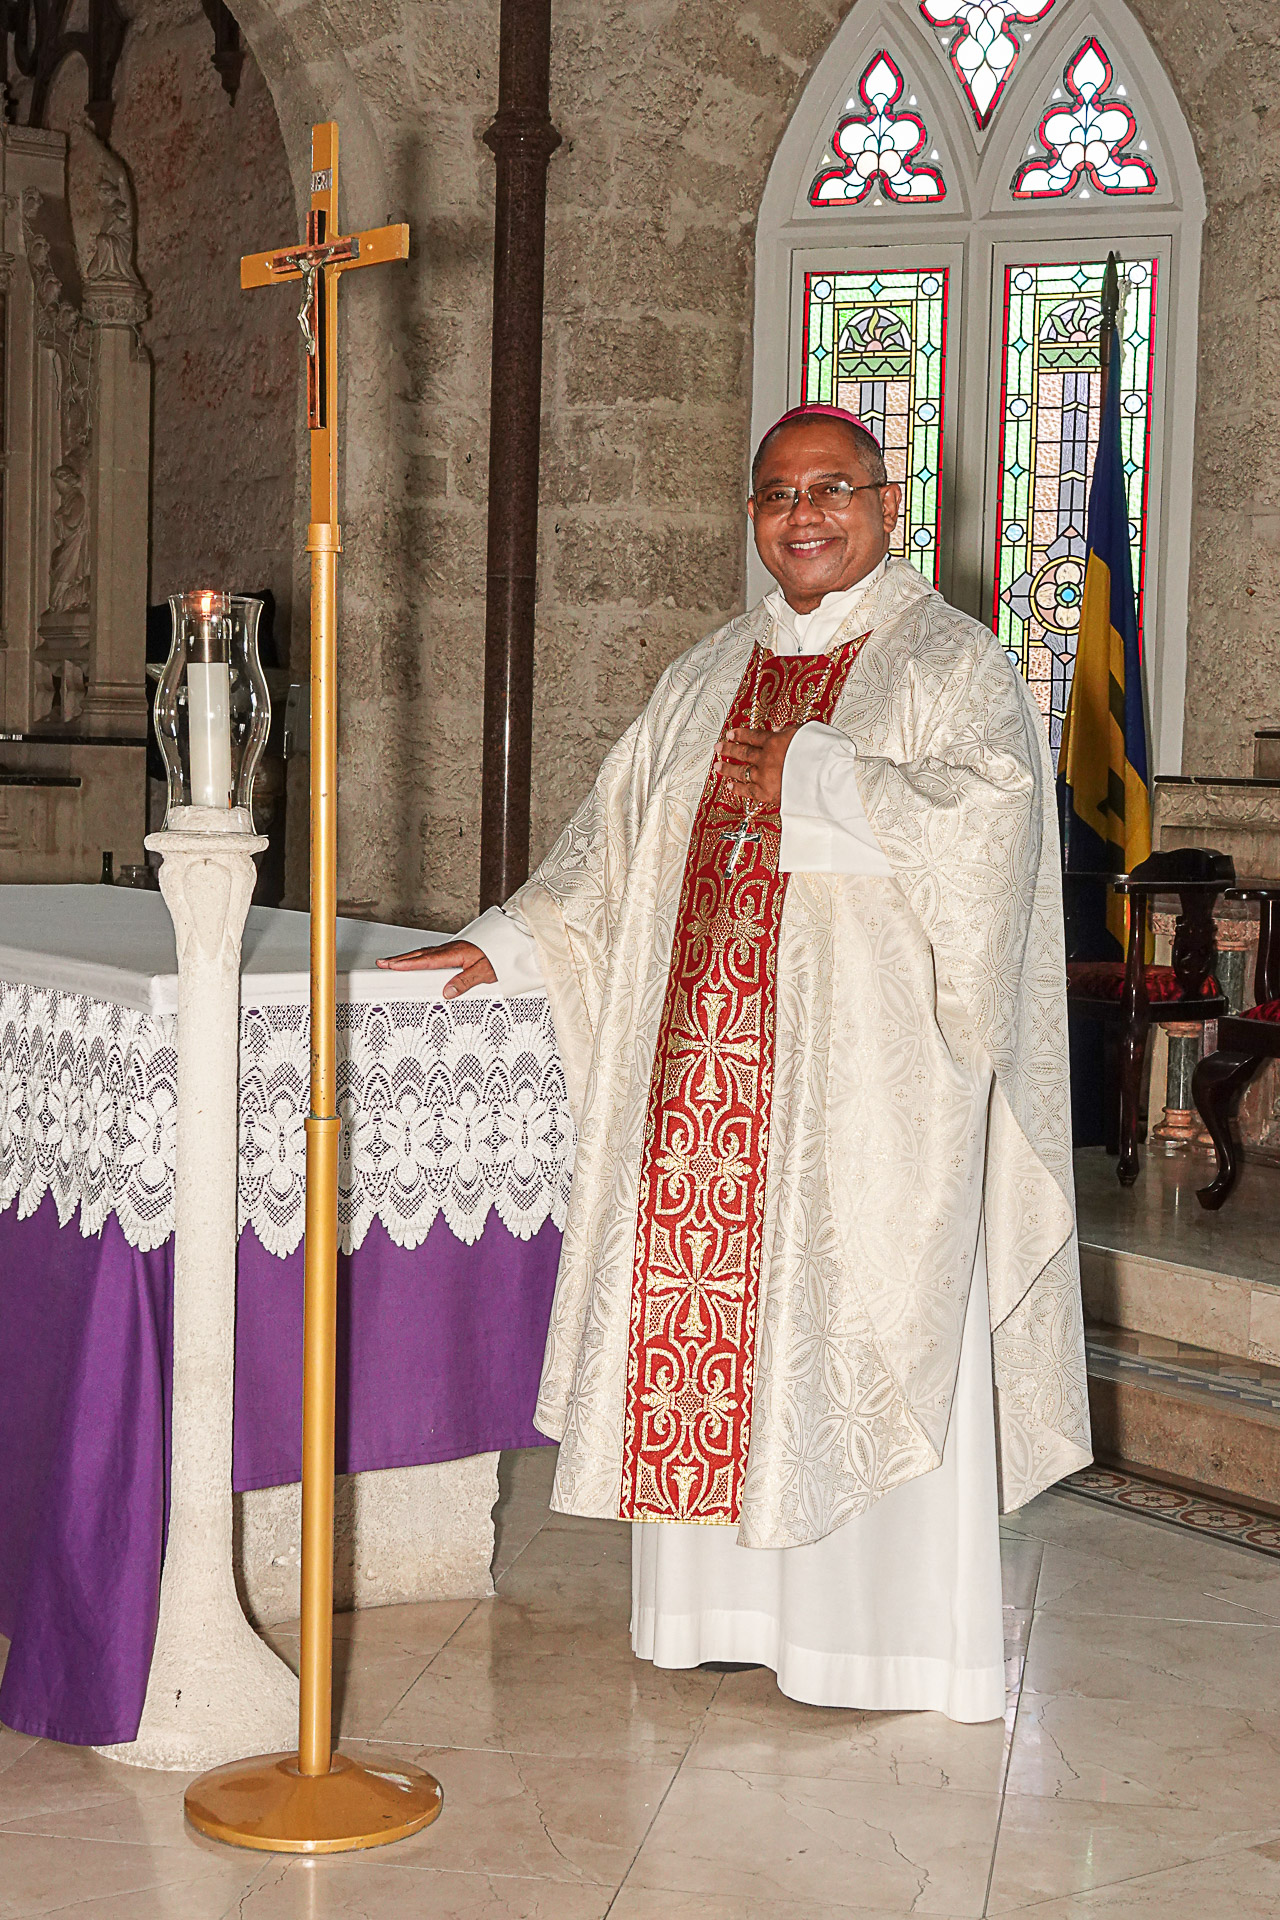 Fr. Neil Sebastian Scantlebury, the next bishop of the Catholic Diocese of Bridgetown!